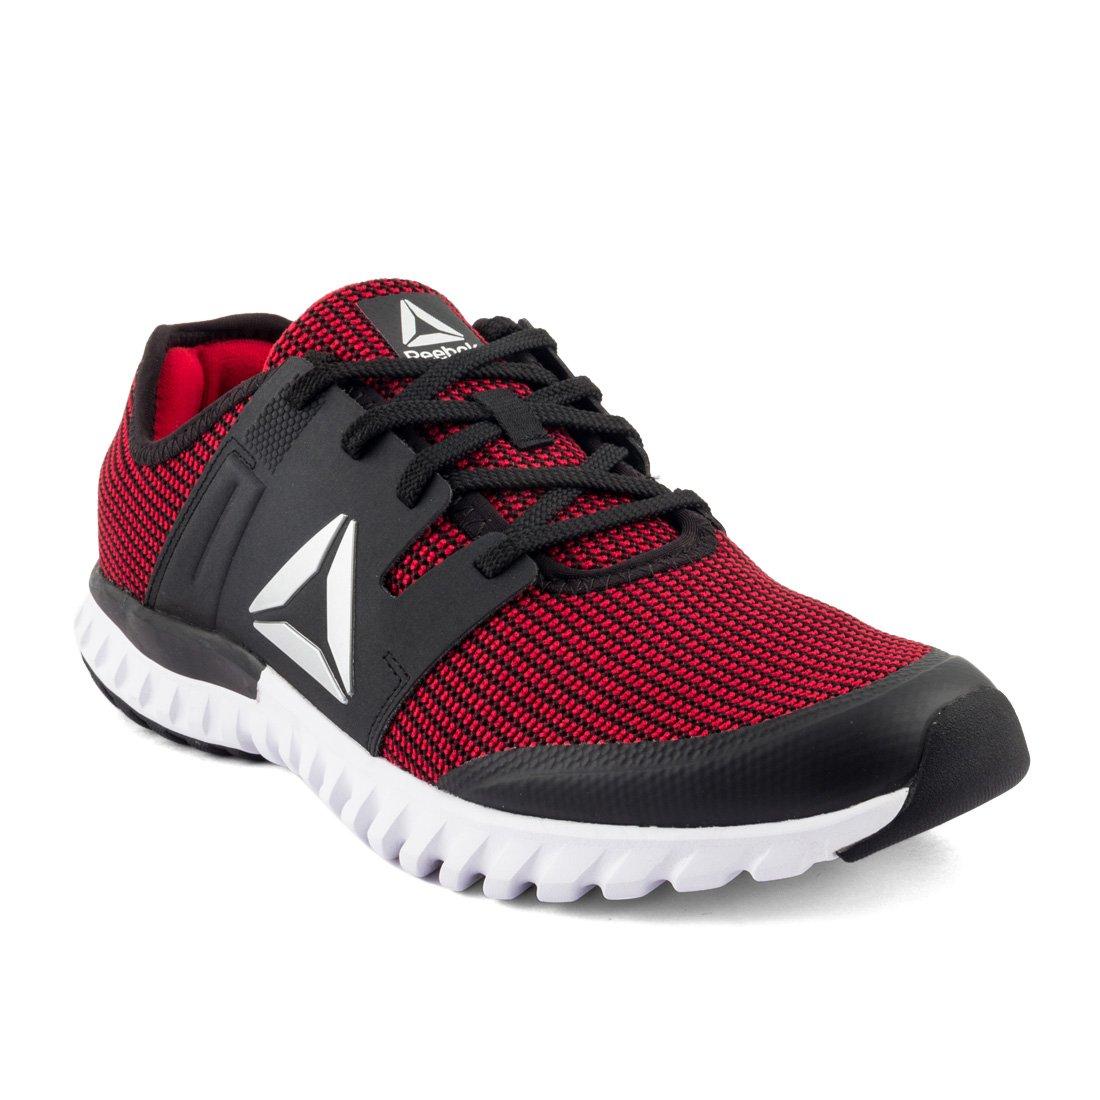 b6effcb039ab Reebok Twist Run Men s Sports Running Shoe  Buy Online at Low Prices in  India - Amazon.in